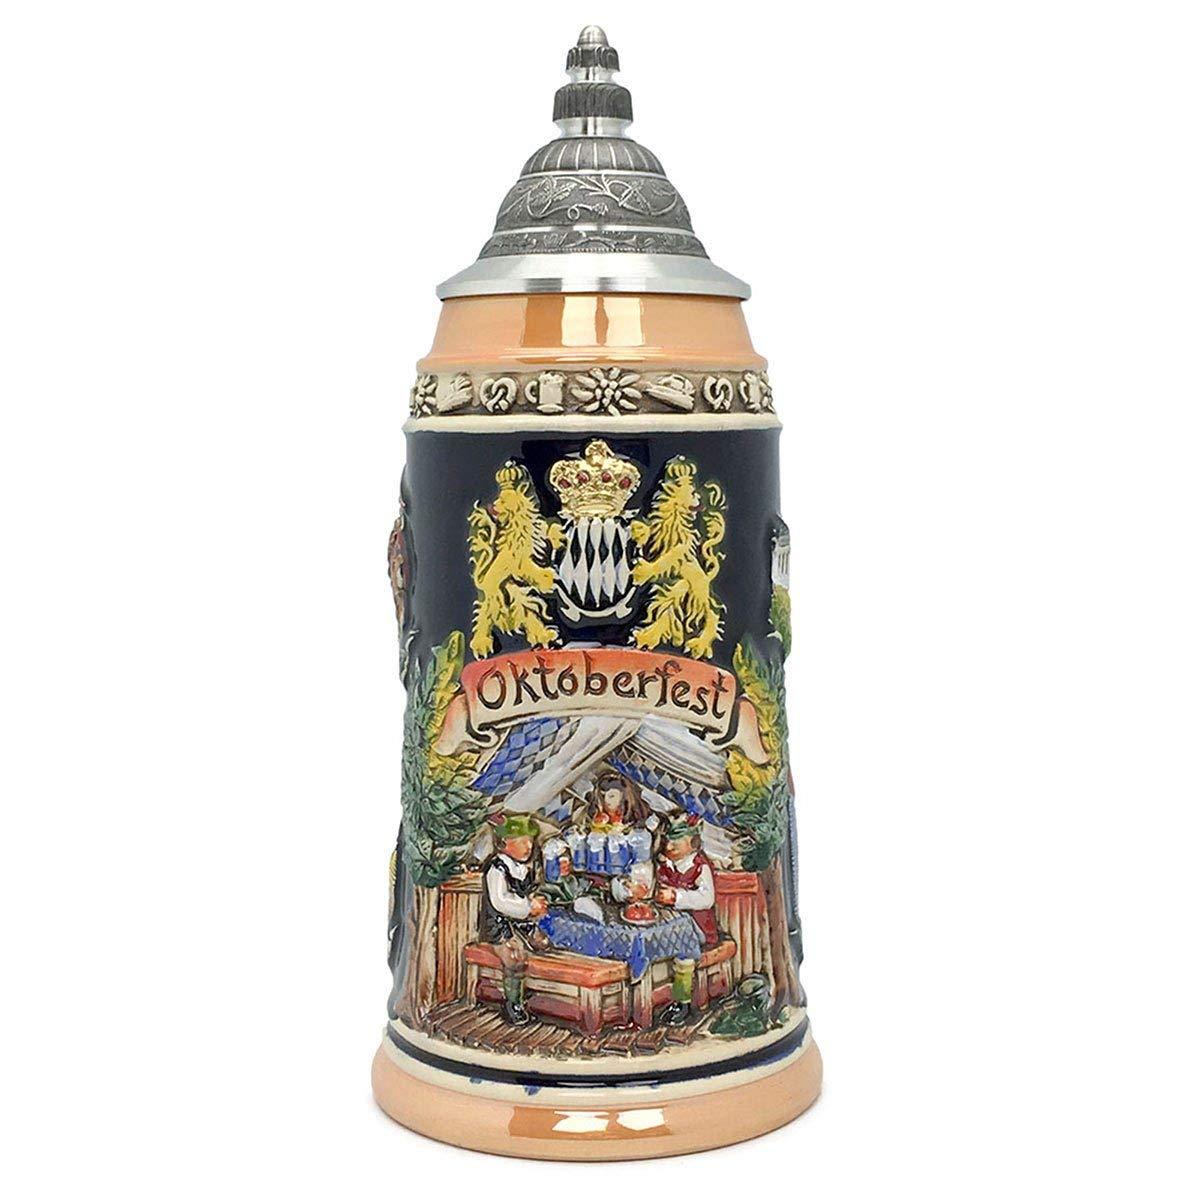 Oktoberfest Mug Bavarian Lions 1 Liter Tankard Zoller & Born Mug Made in Germany German Collectible Ceramic Beer Stein with Lid